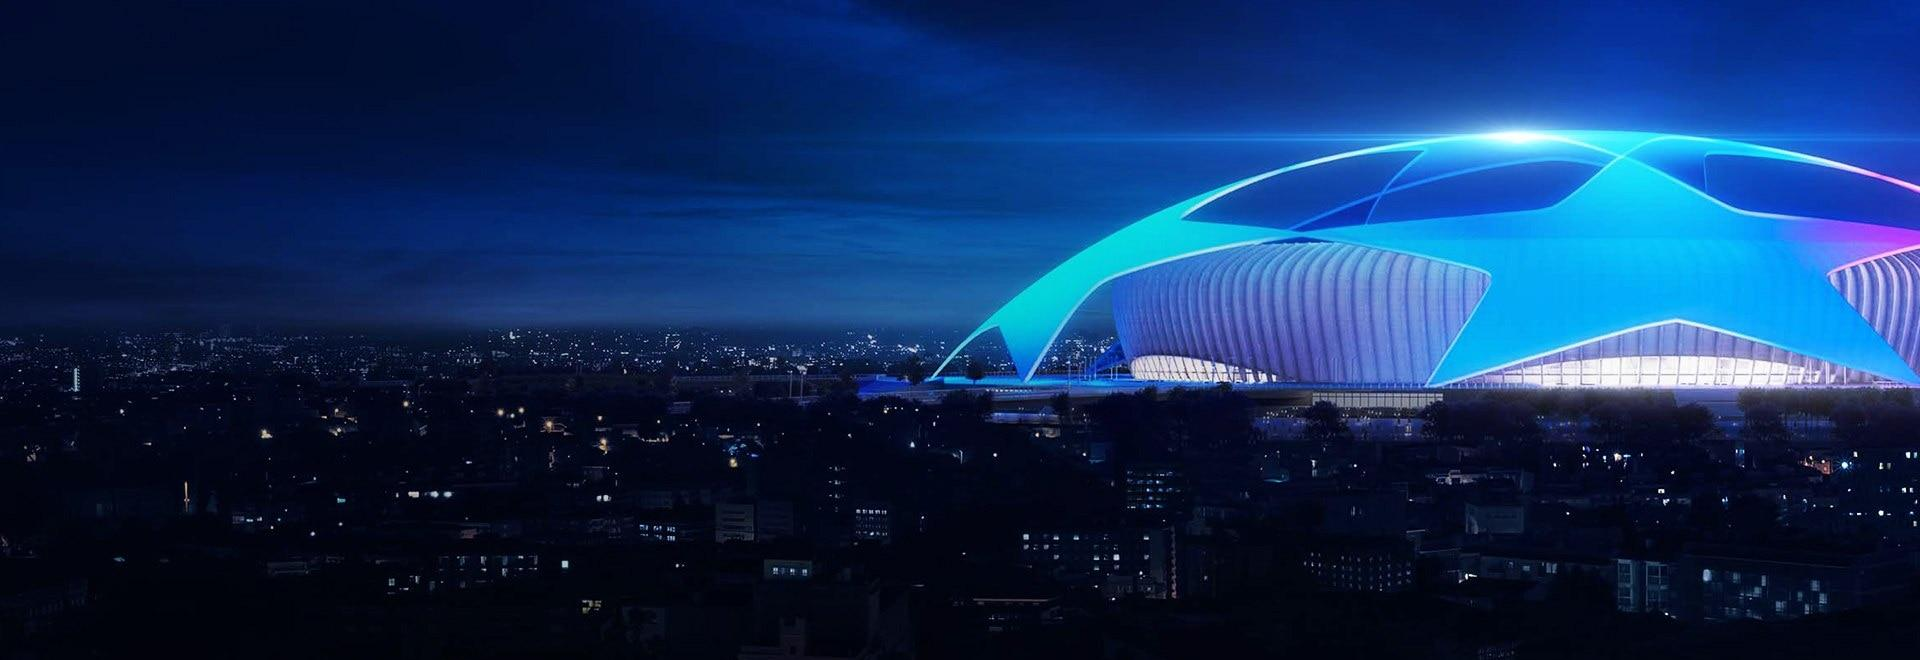 Psv Eindhoven - Benfica